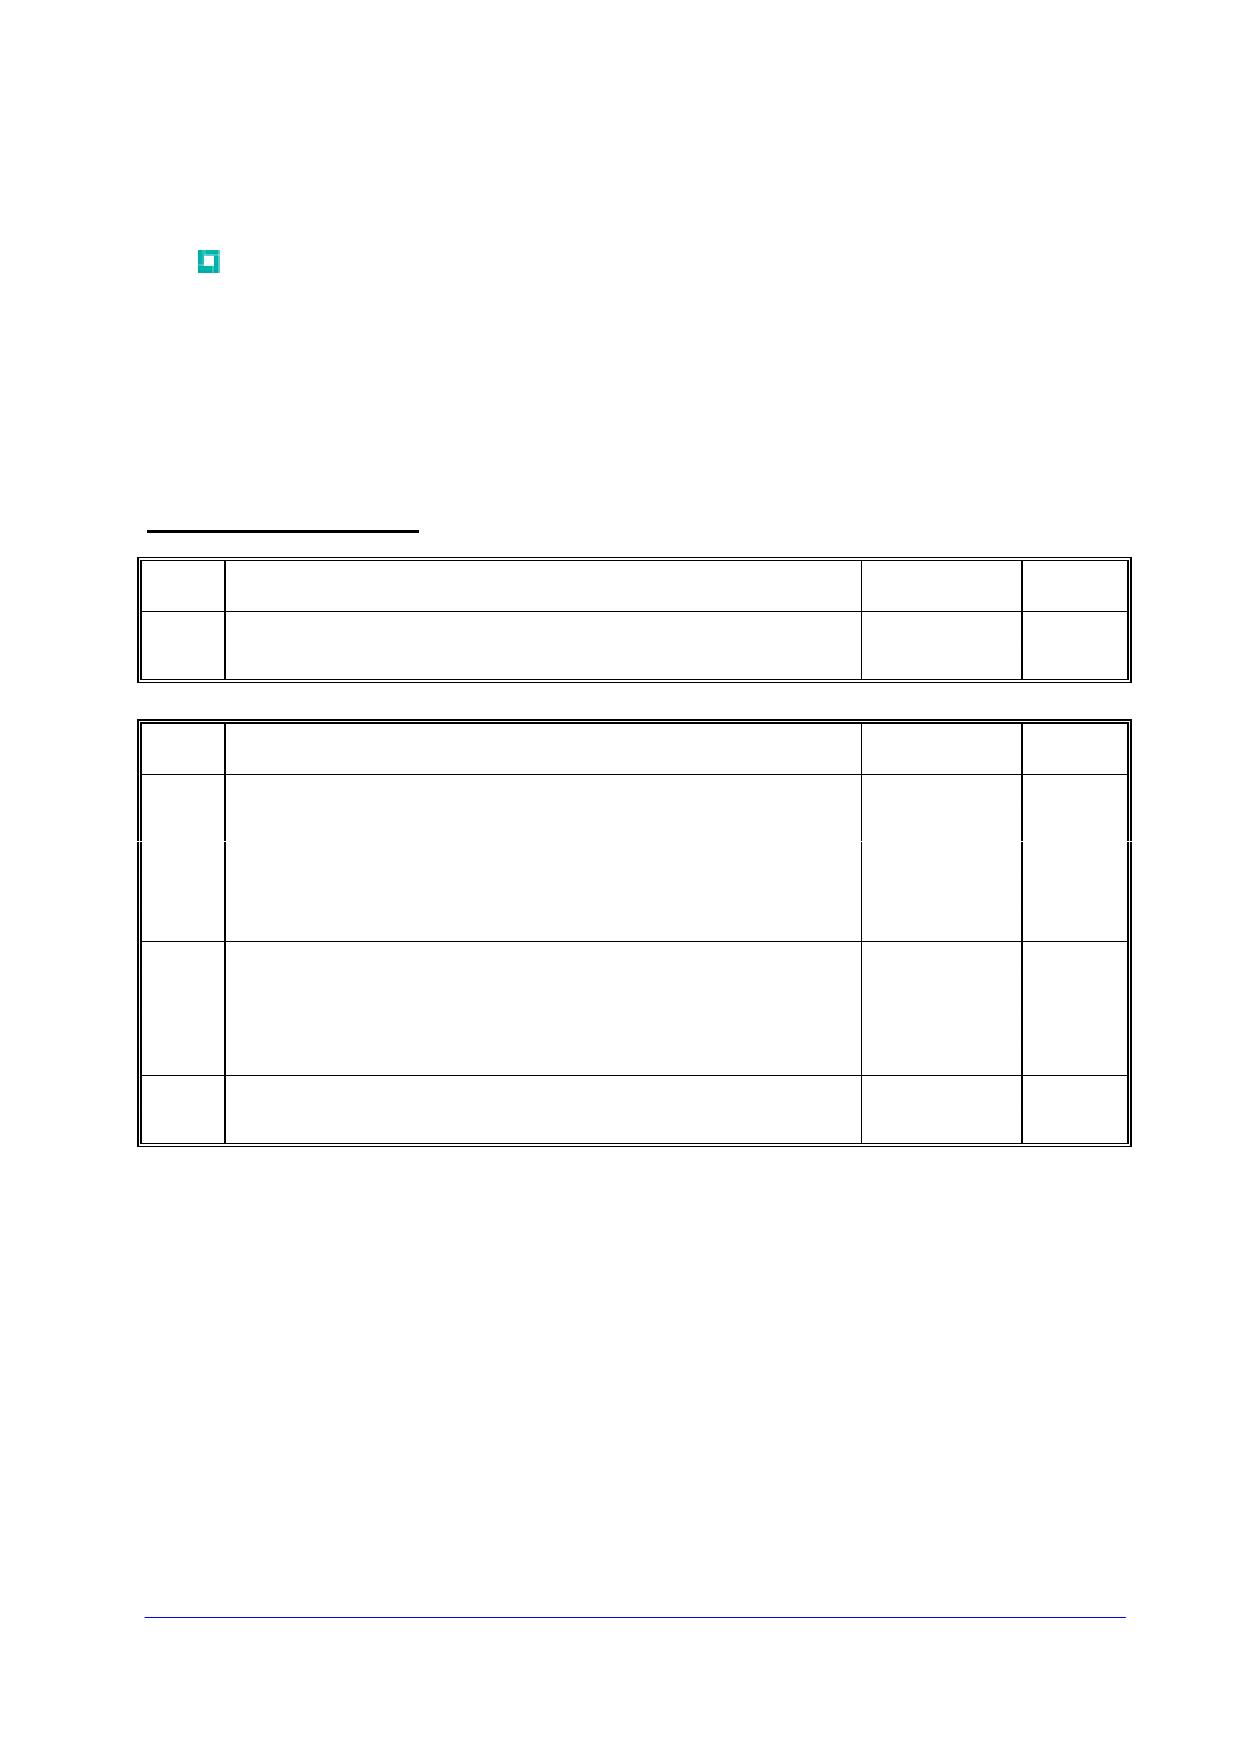 M0358WC140 دیتاشیت PDF